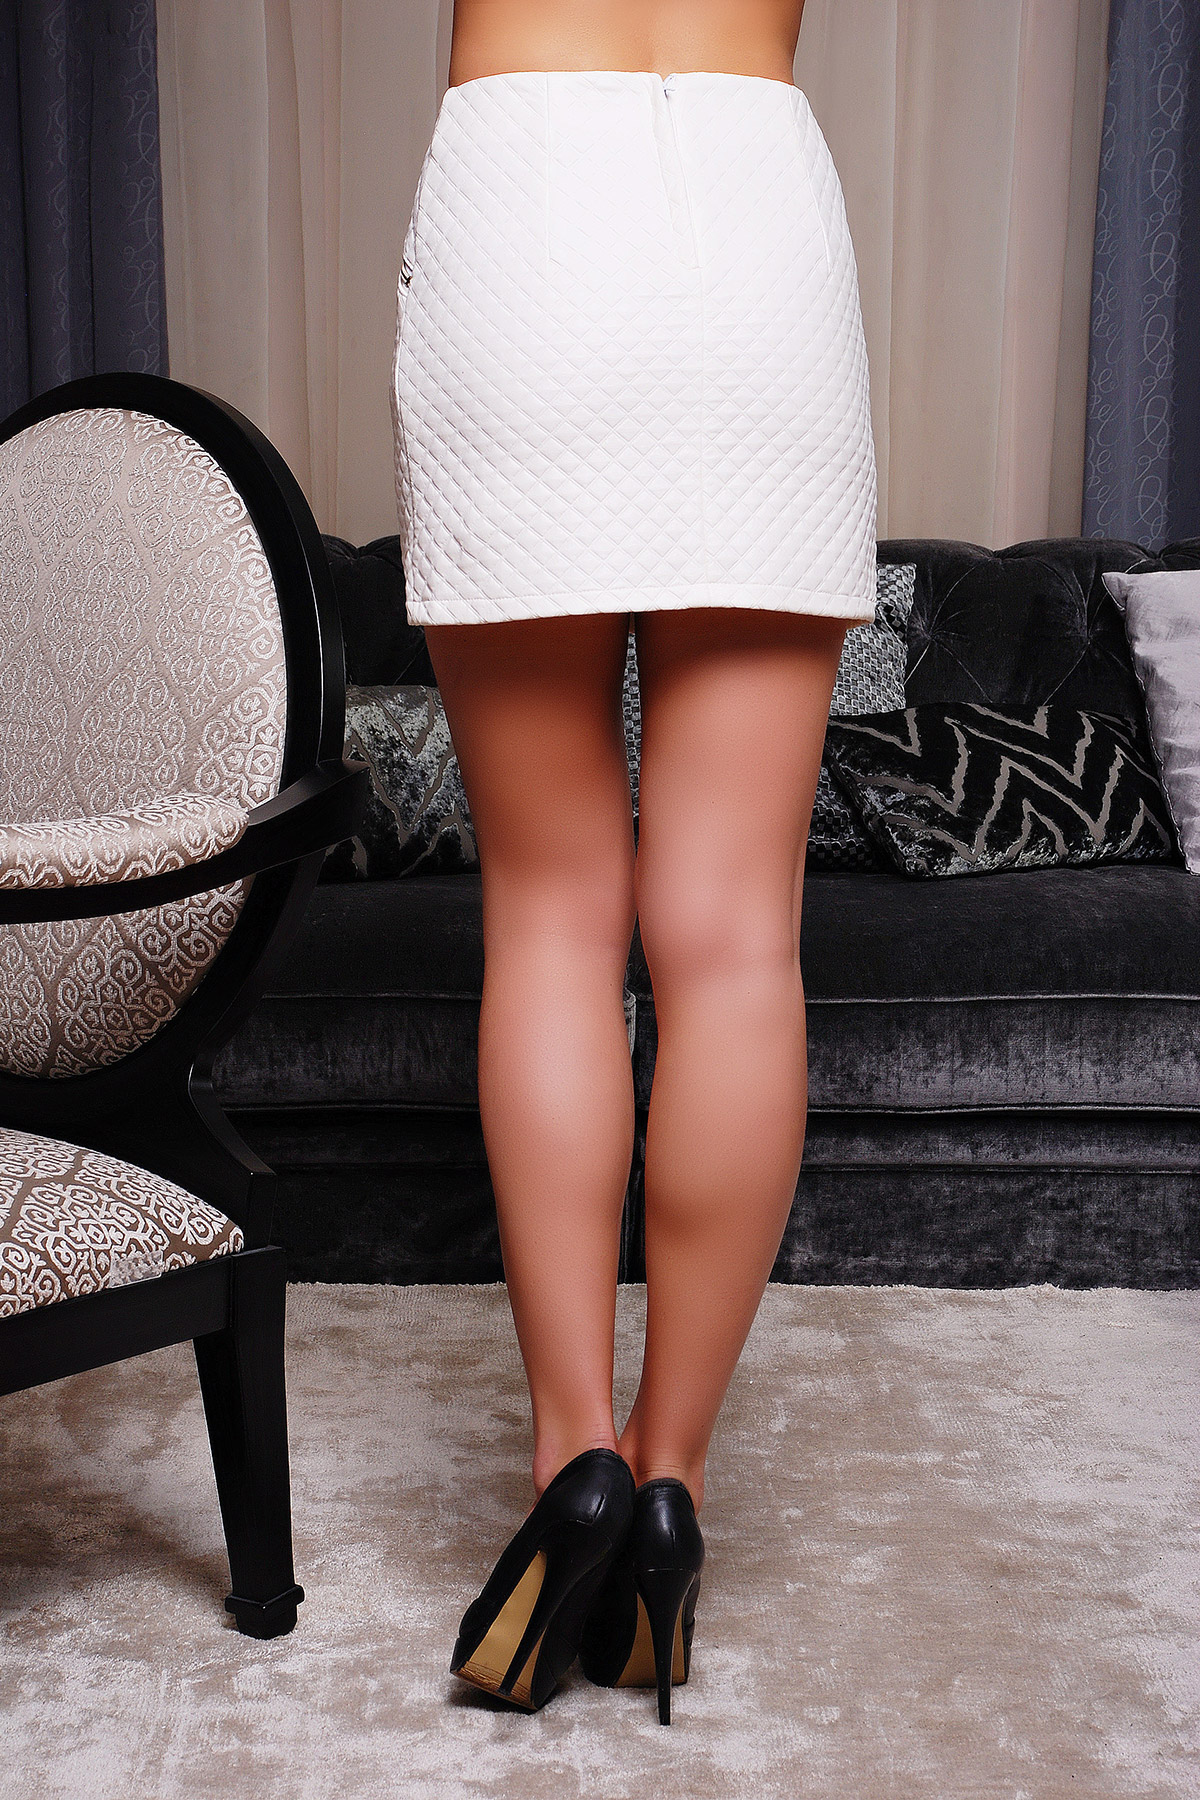 . юбка мод. №6. Цвет: белый